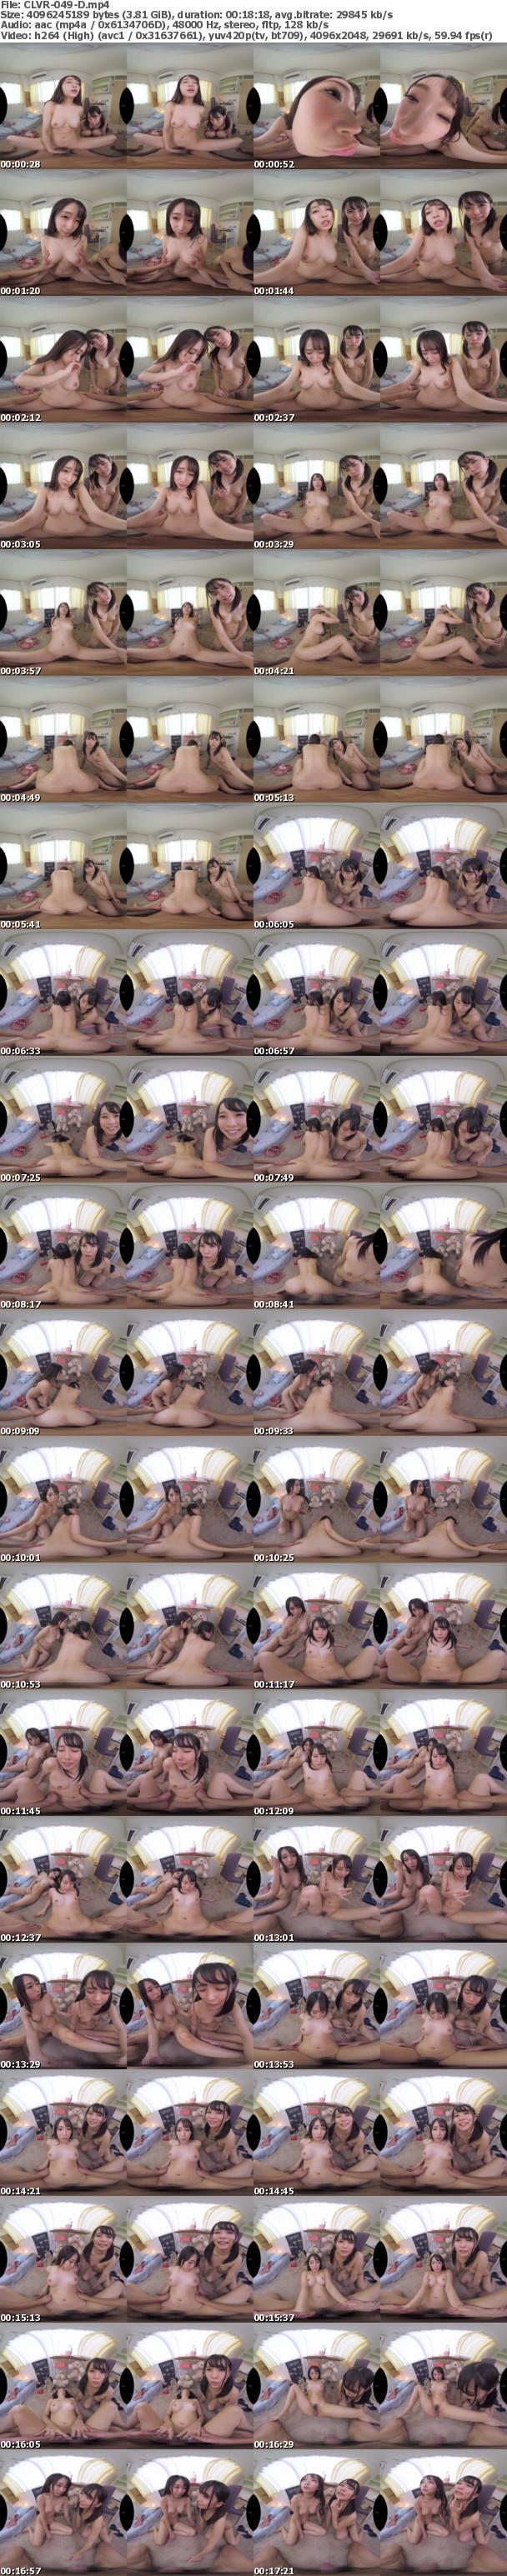 (VR) CLVR-049 耳元ではバイノーラル音声!目の前ではリアルSEX! 旅行中の彼女と電話をしながら彼女の妹と無茶苦茶SEXをした 男なら共感できる!罪悪感と背徳感の狭間でする最高に気持ちいいSEX体験VR!!